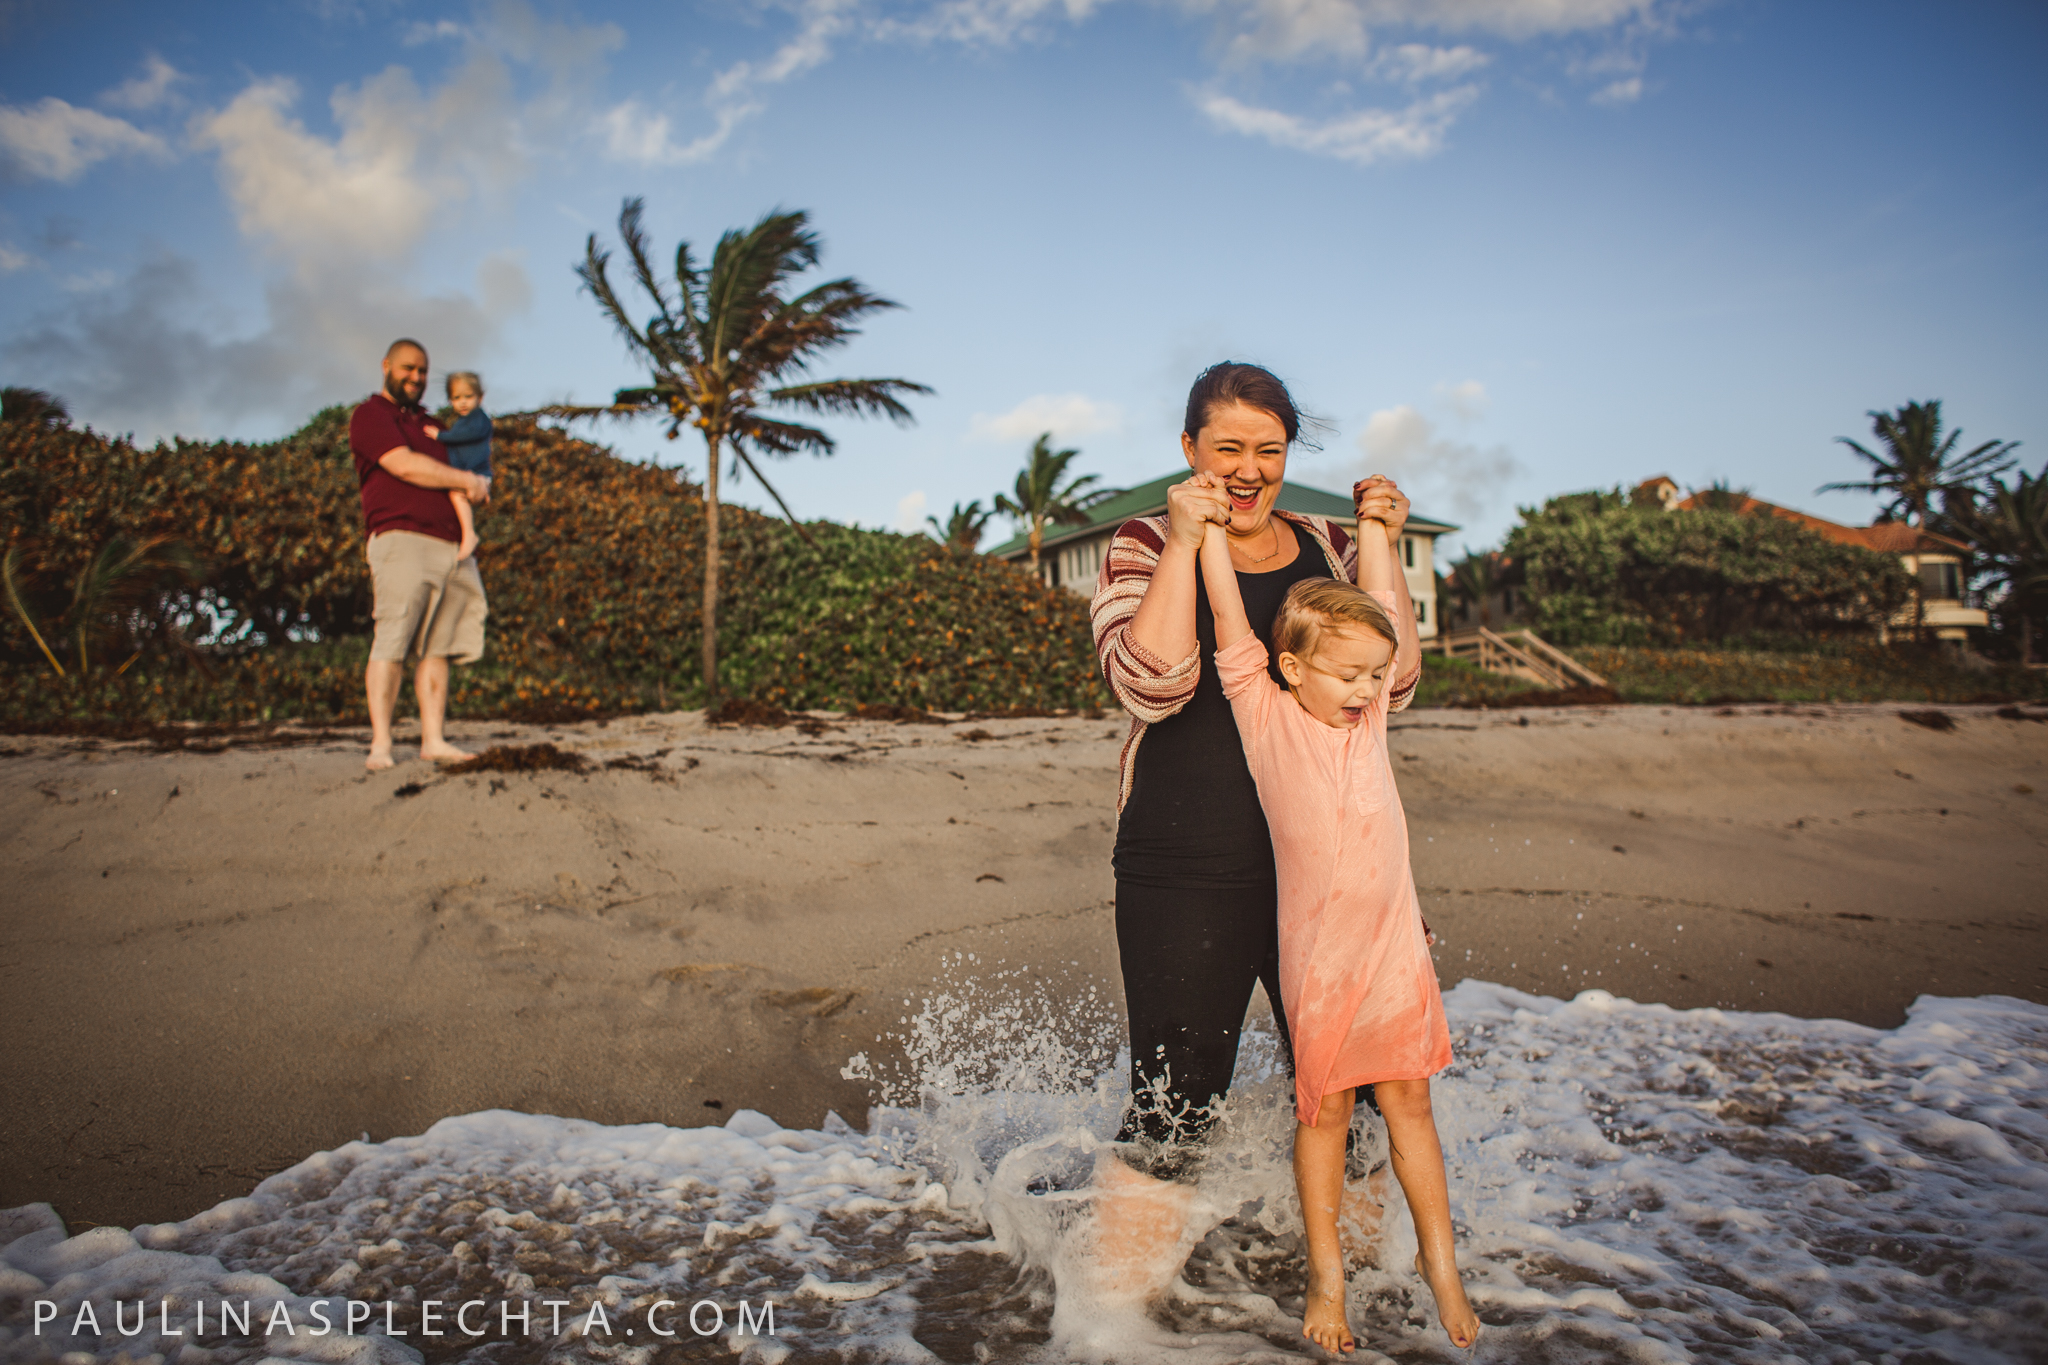 Family Photographer South Florida Pompano Broward Palm Beach Babies Baby Newborn Breastfeeding Birth Photograpy Beach Home Documentary Session-113.jpg